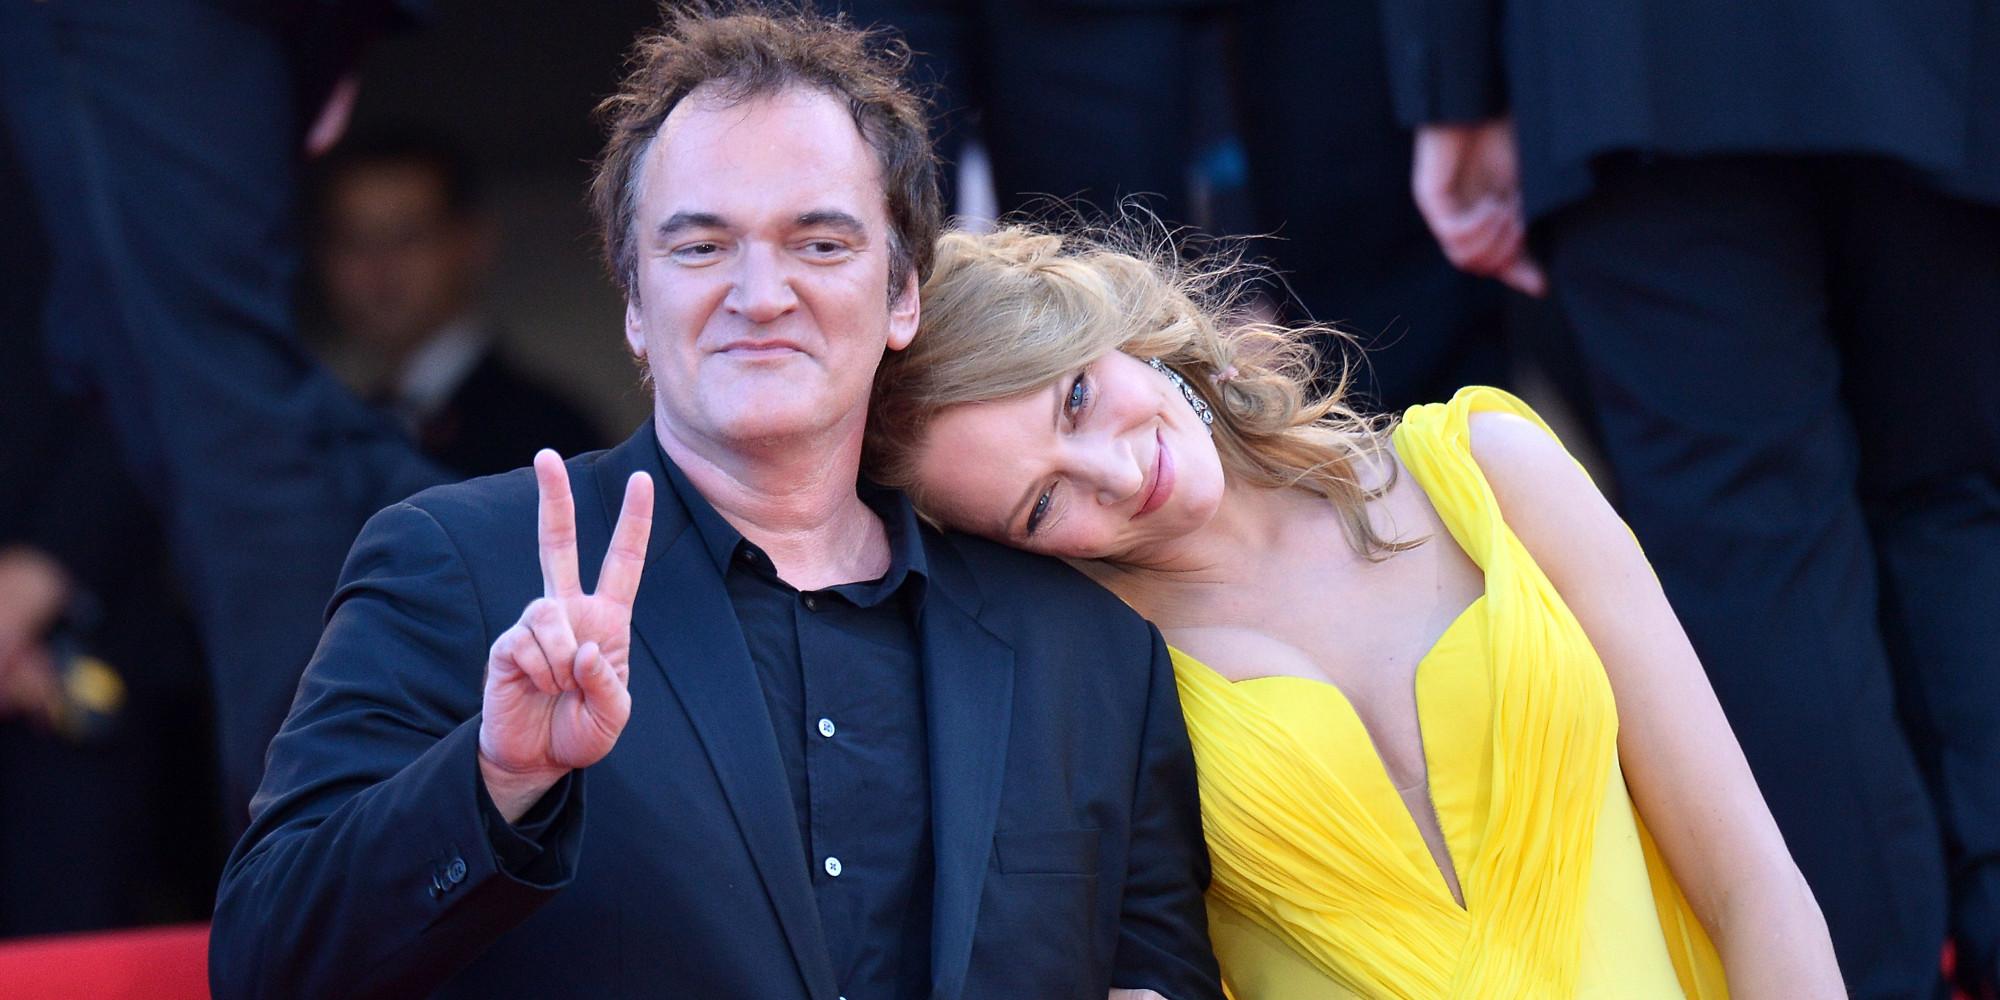 Didem Erol Quentin Tarantino